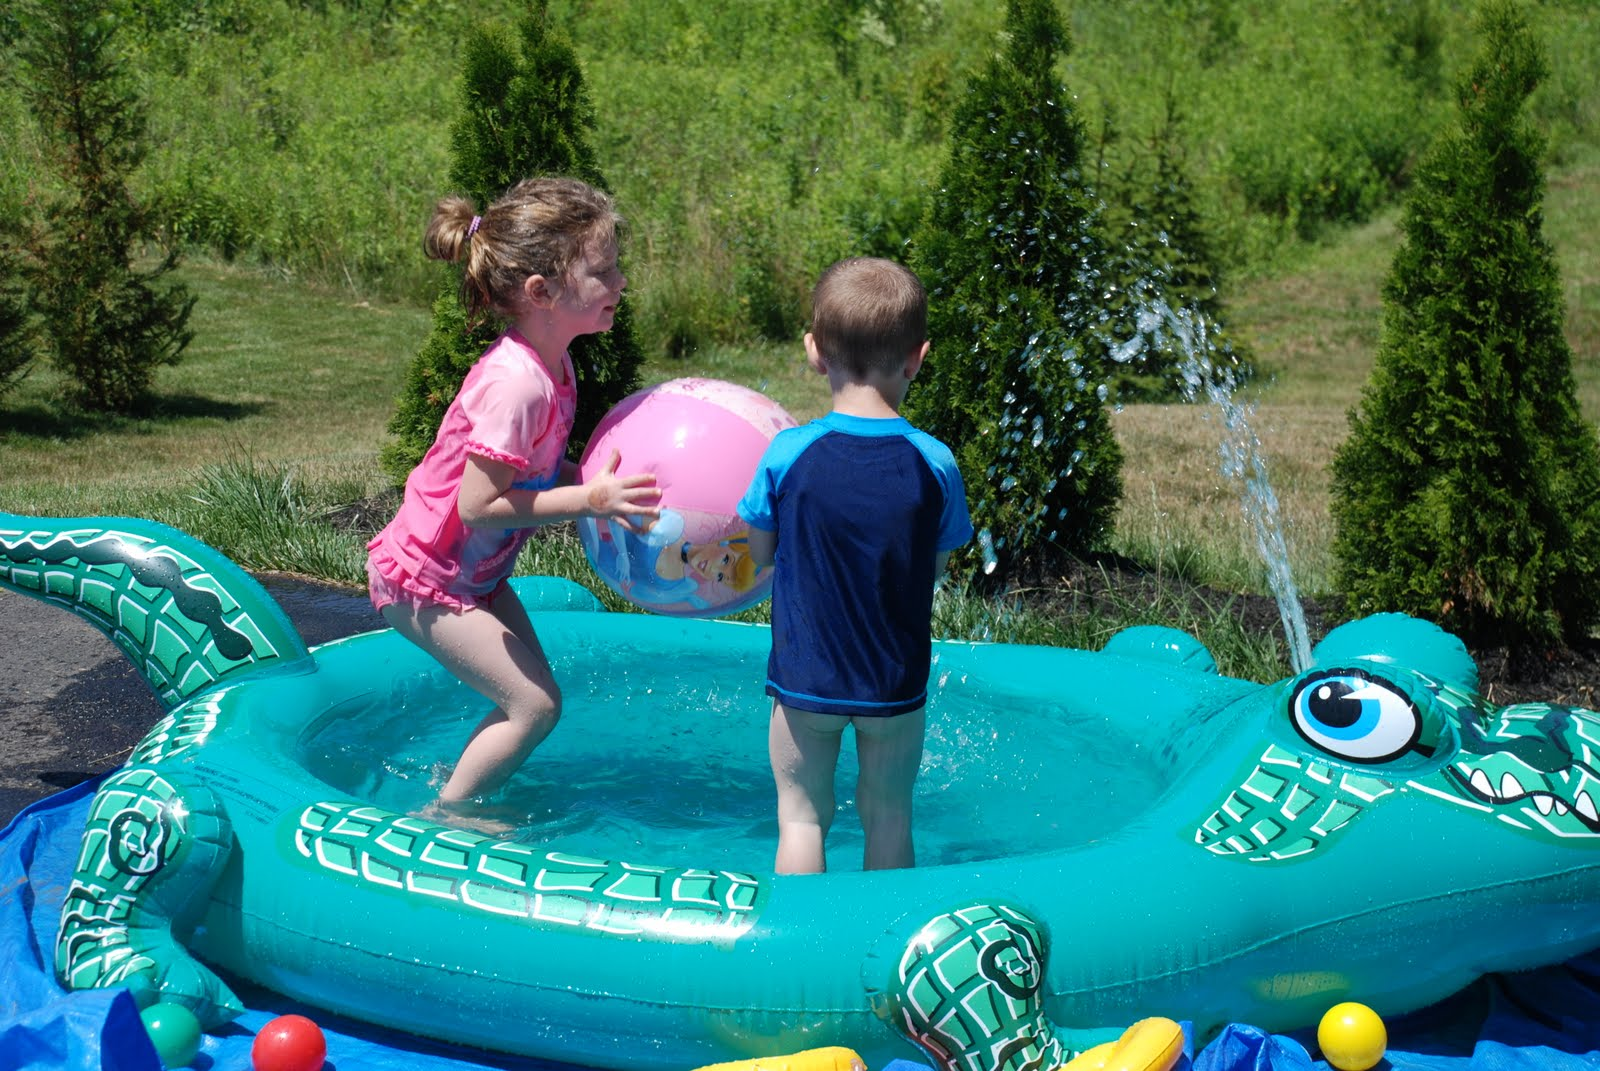 Busy Lee Family: Sprinkler Fun!